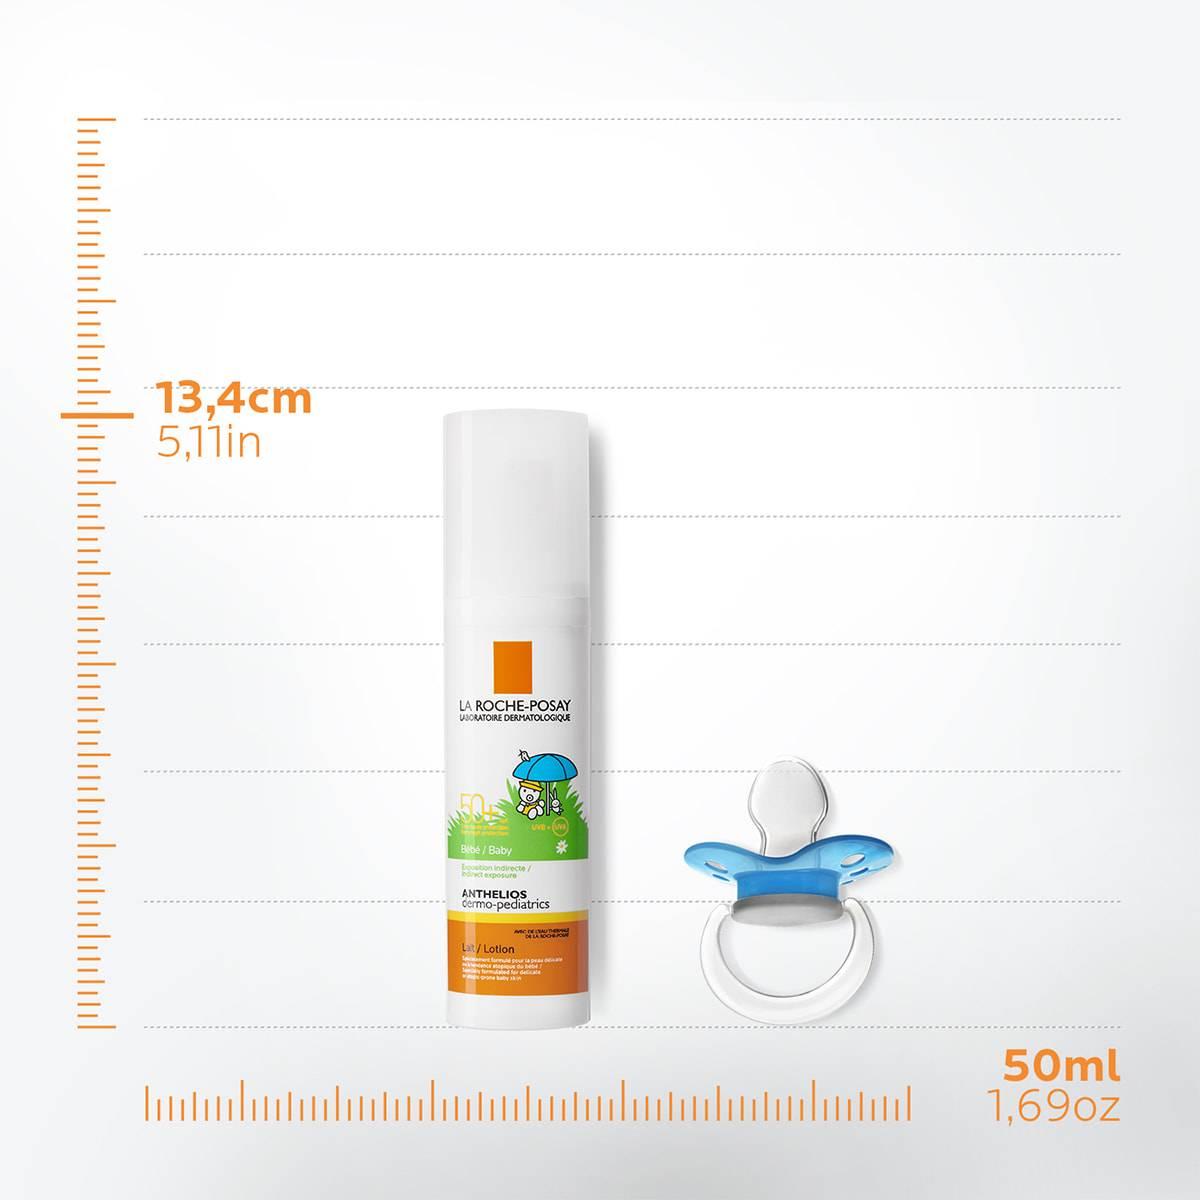 La Roche Posay ProduktSide Sol Anthelios Dermo Pædiatri Spf50 50ml 3